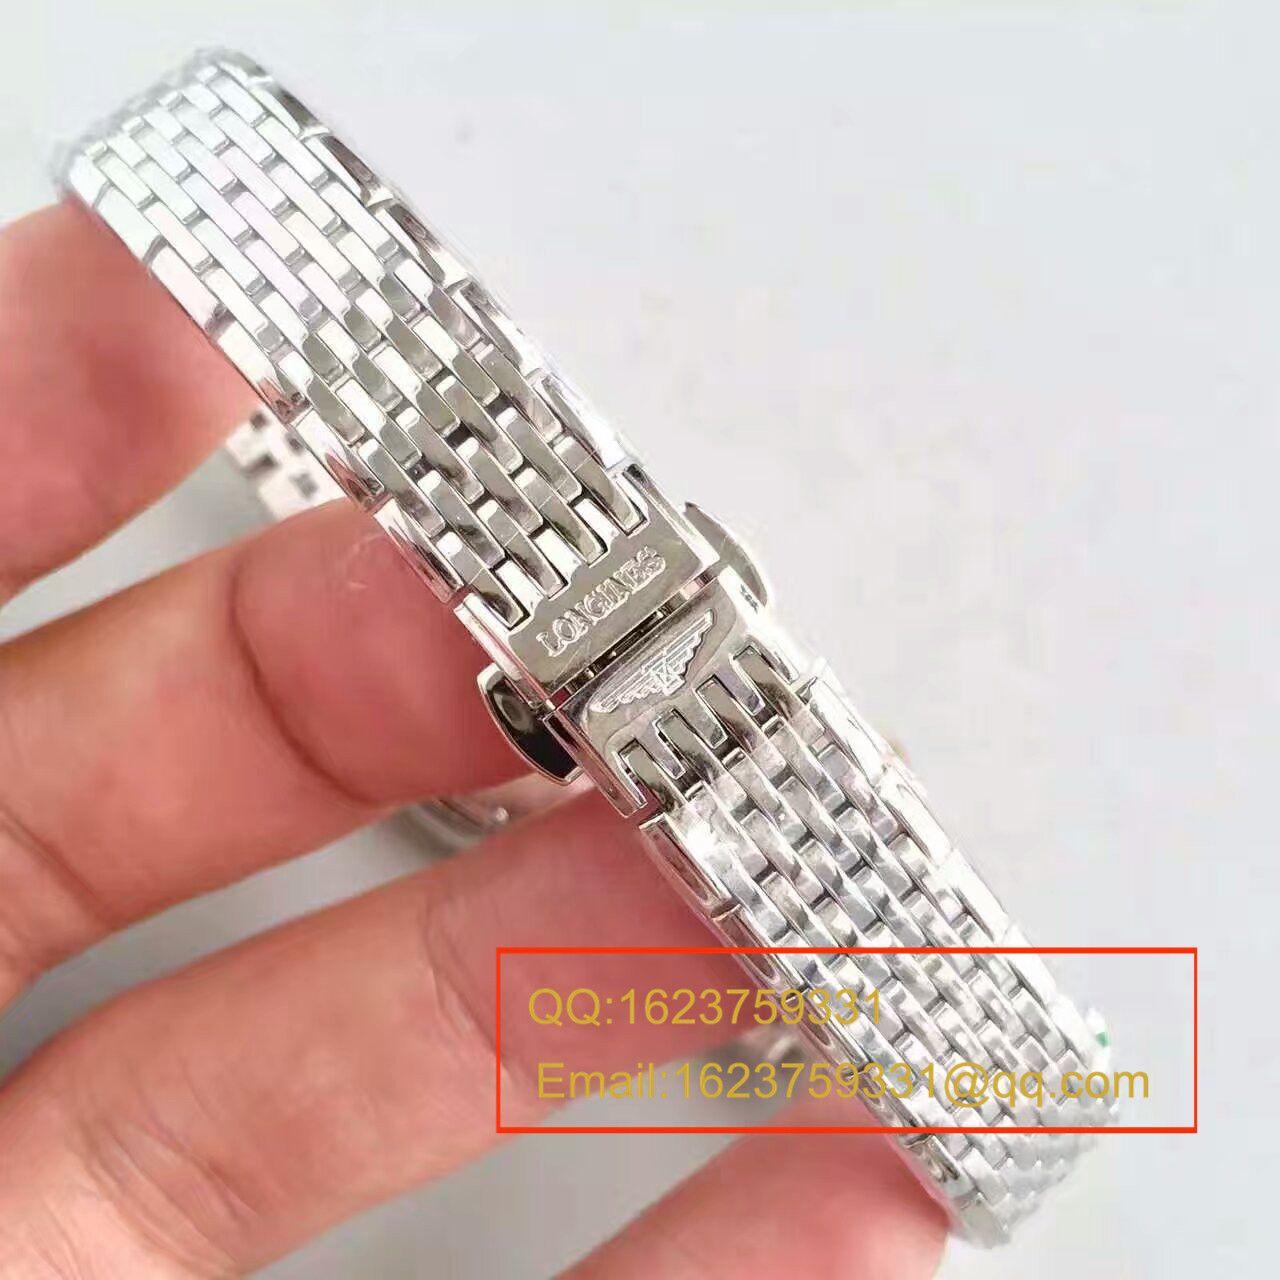 【MK厂超A高仿手表】浪琴优雅系列L4.209.4.11.6女士腕表 / L073